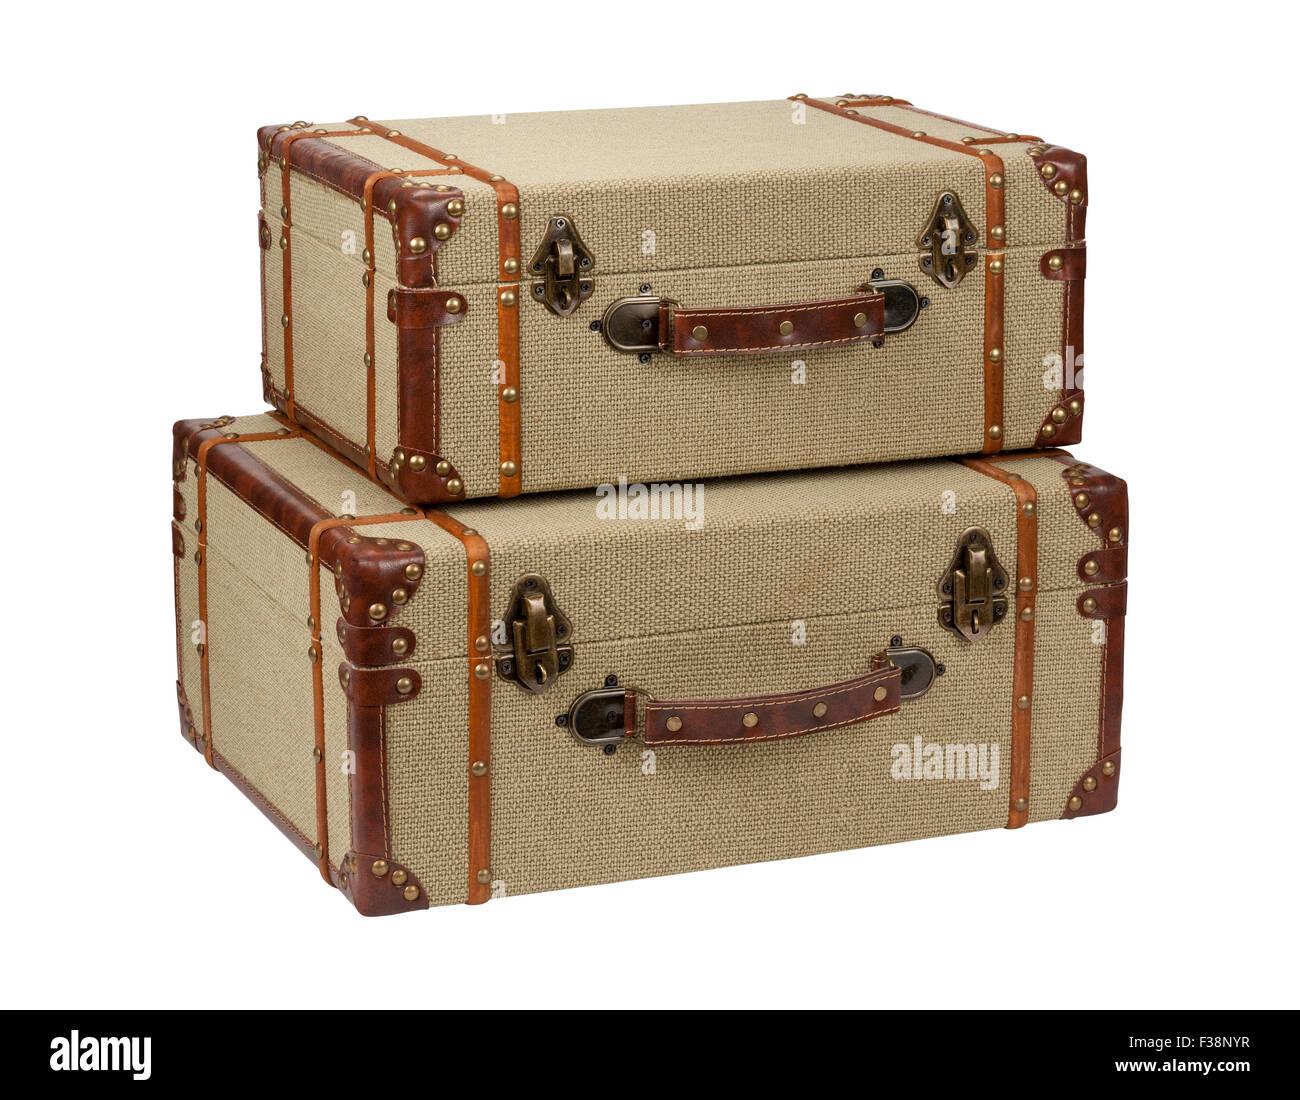 Two Deco Wood Burlap Suitcases. - Stock Image